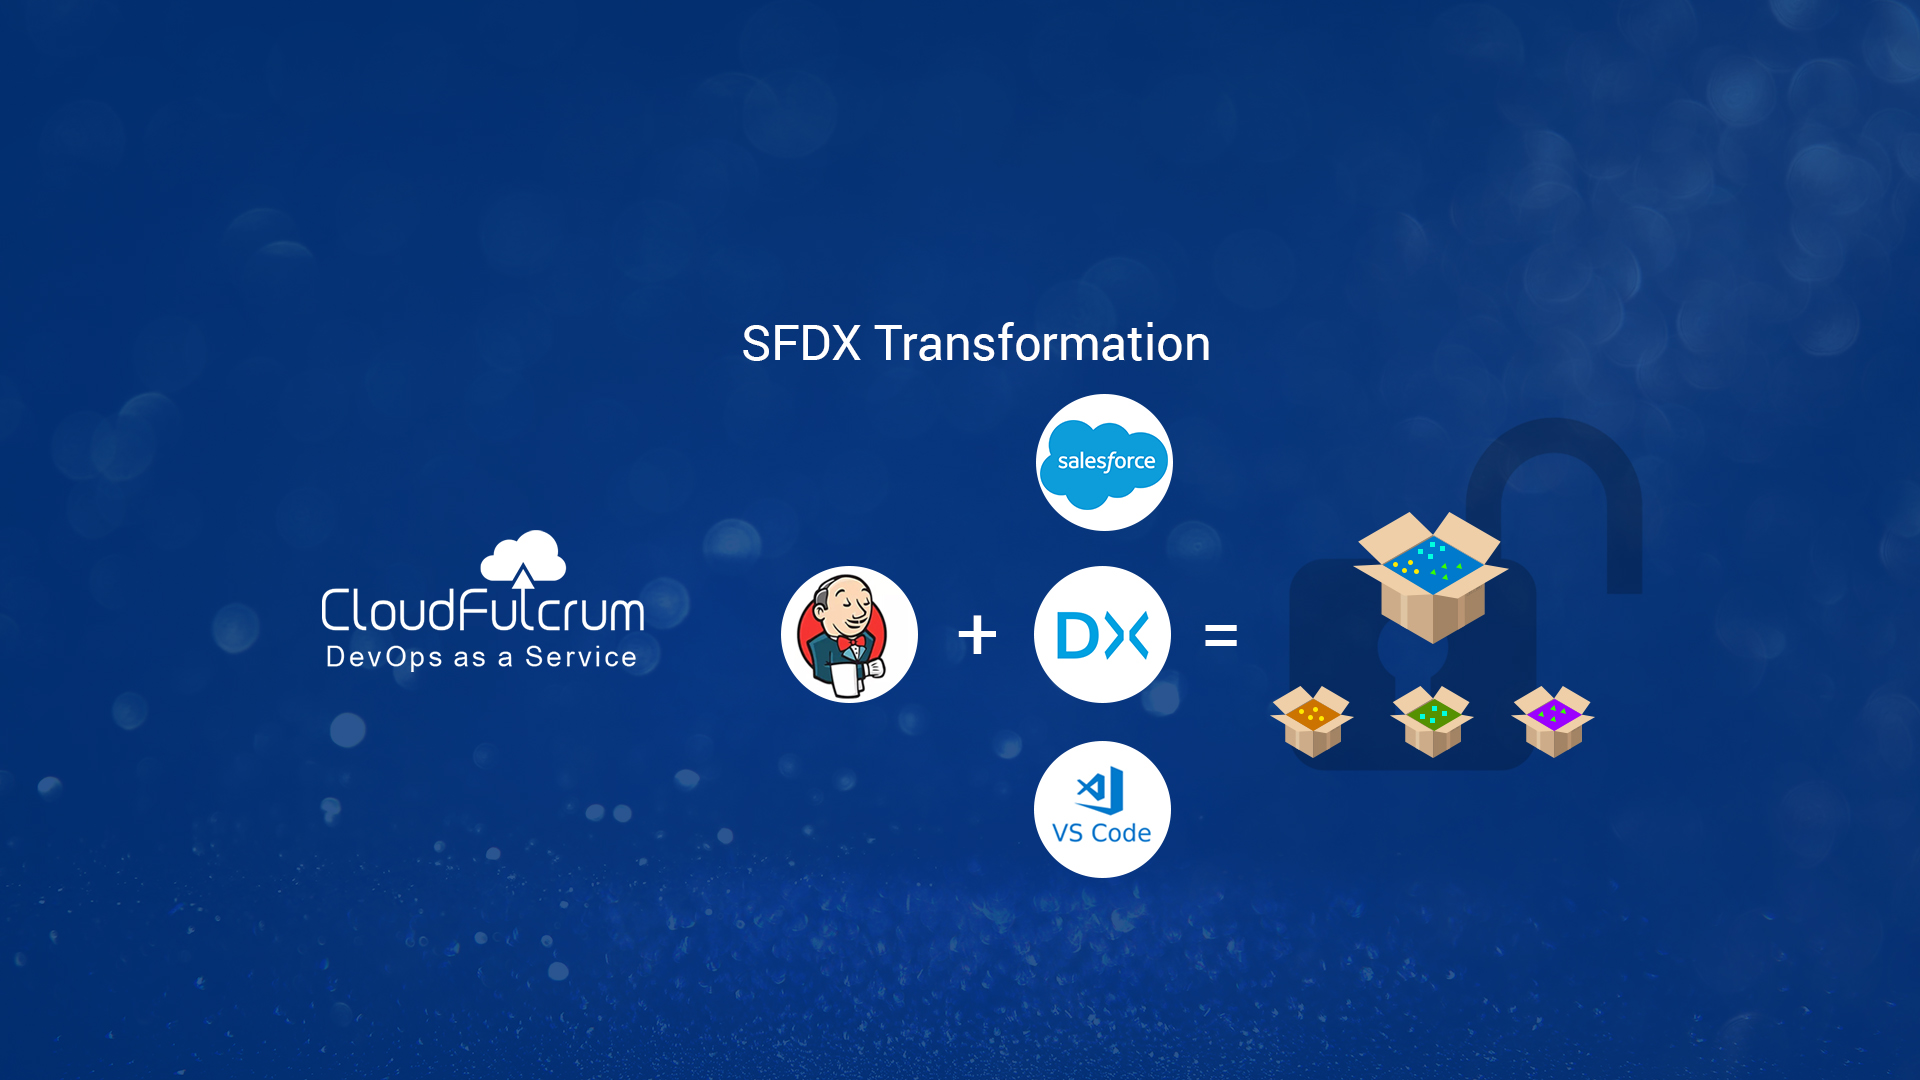 SFDX Transformation